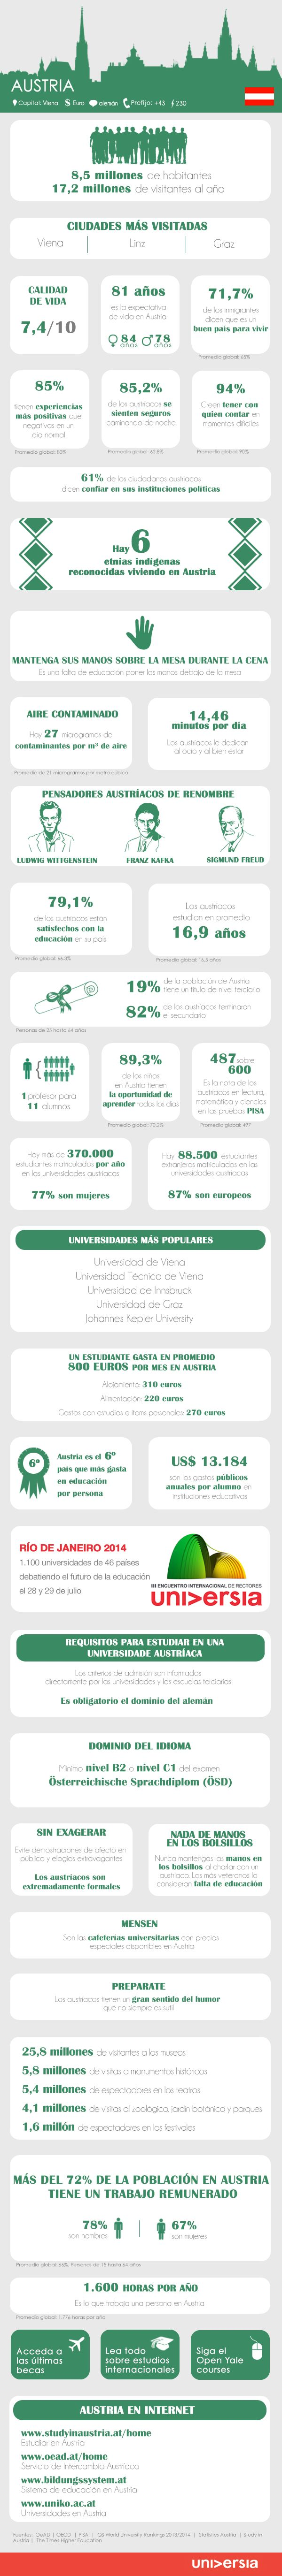 30 datos útiles para estudiar y trabajar en Austria #infografia #infographic #empleo